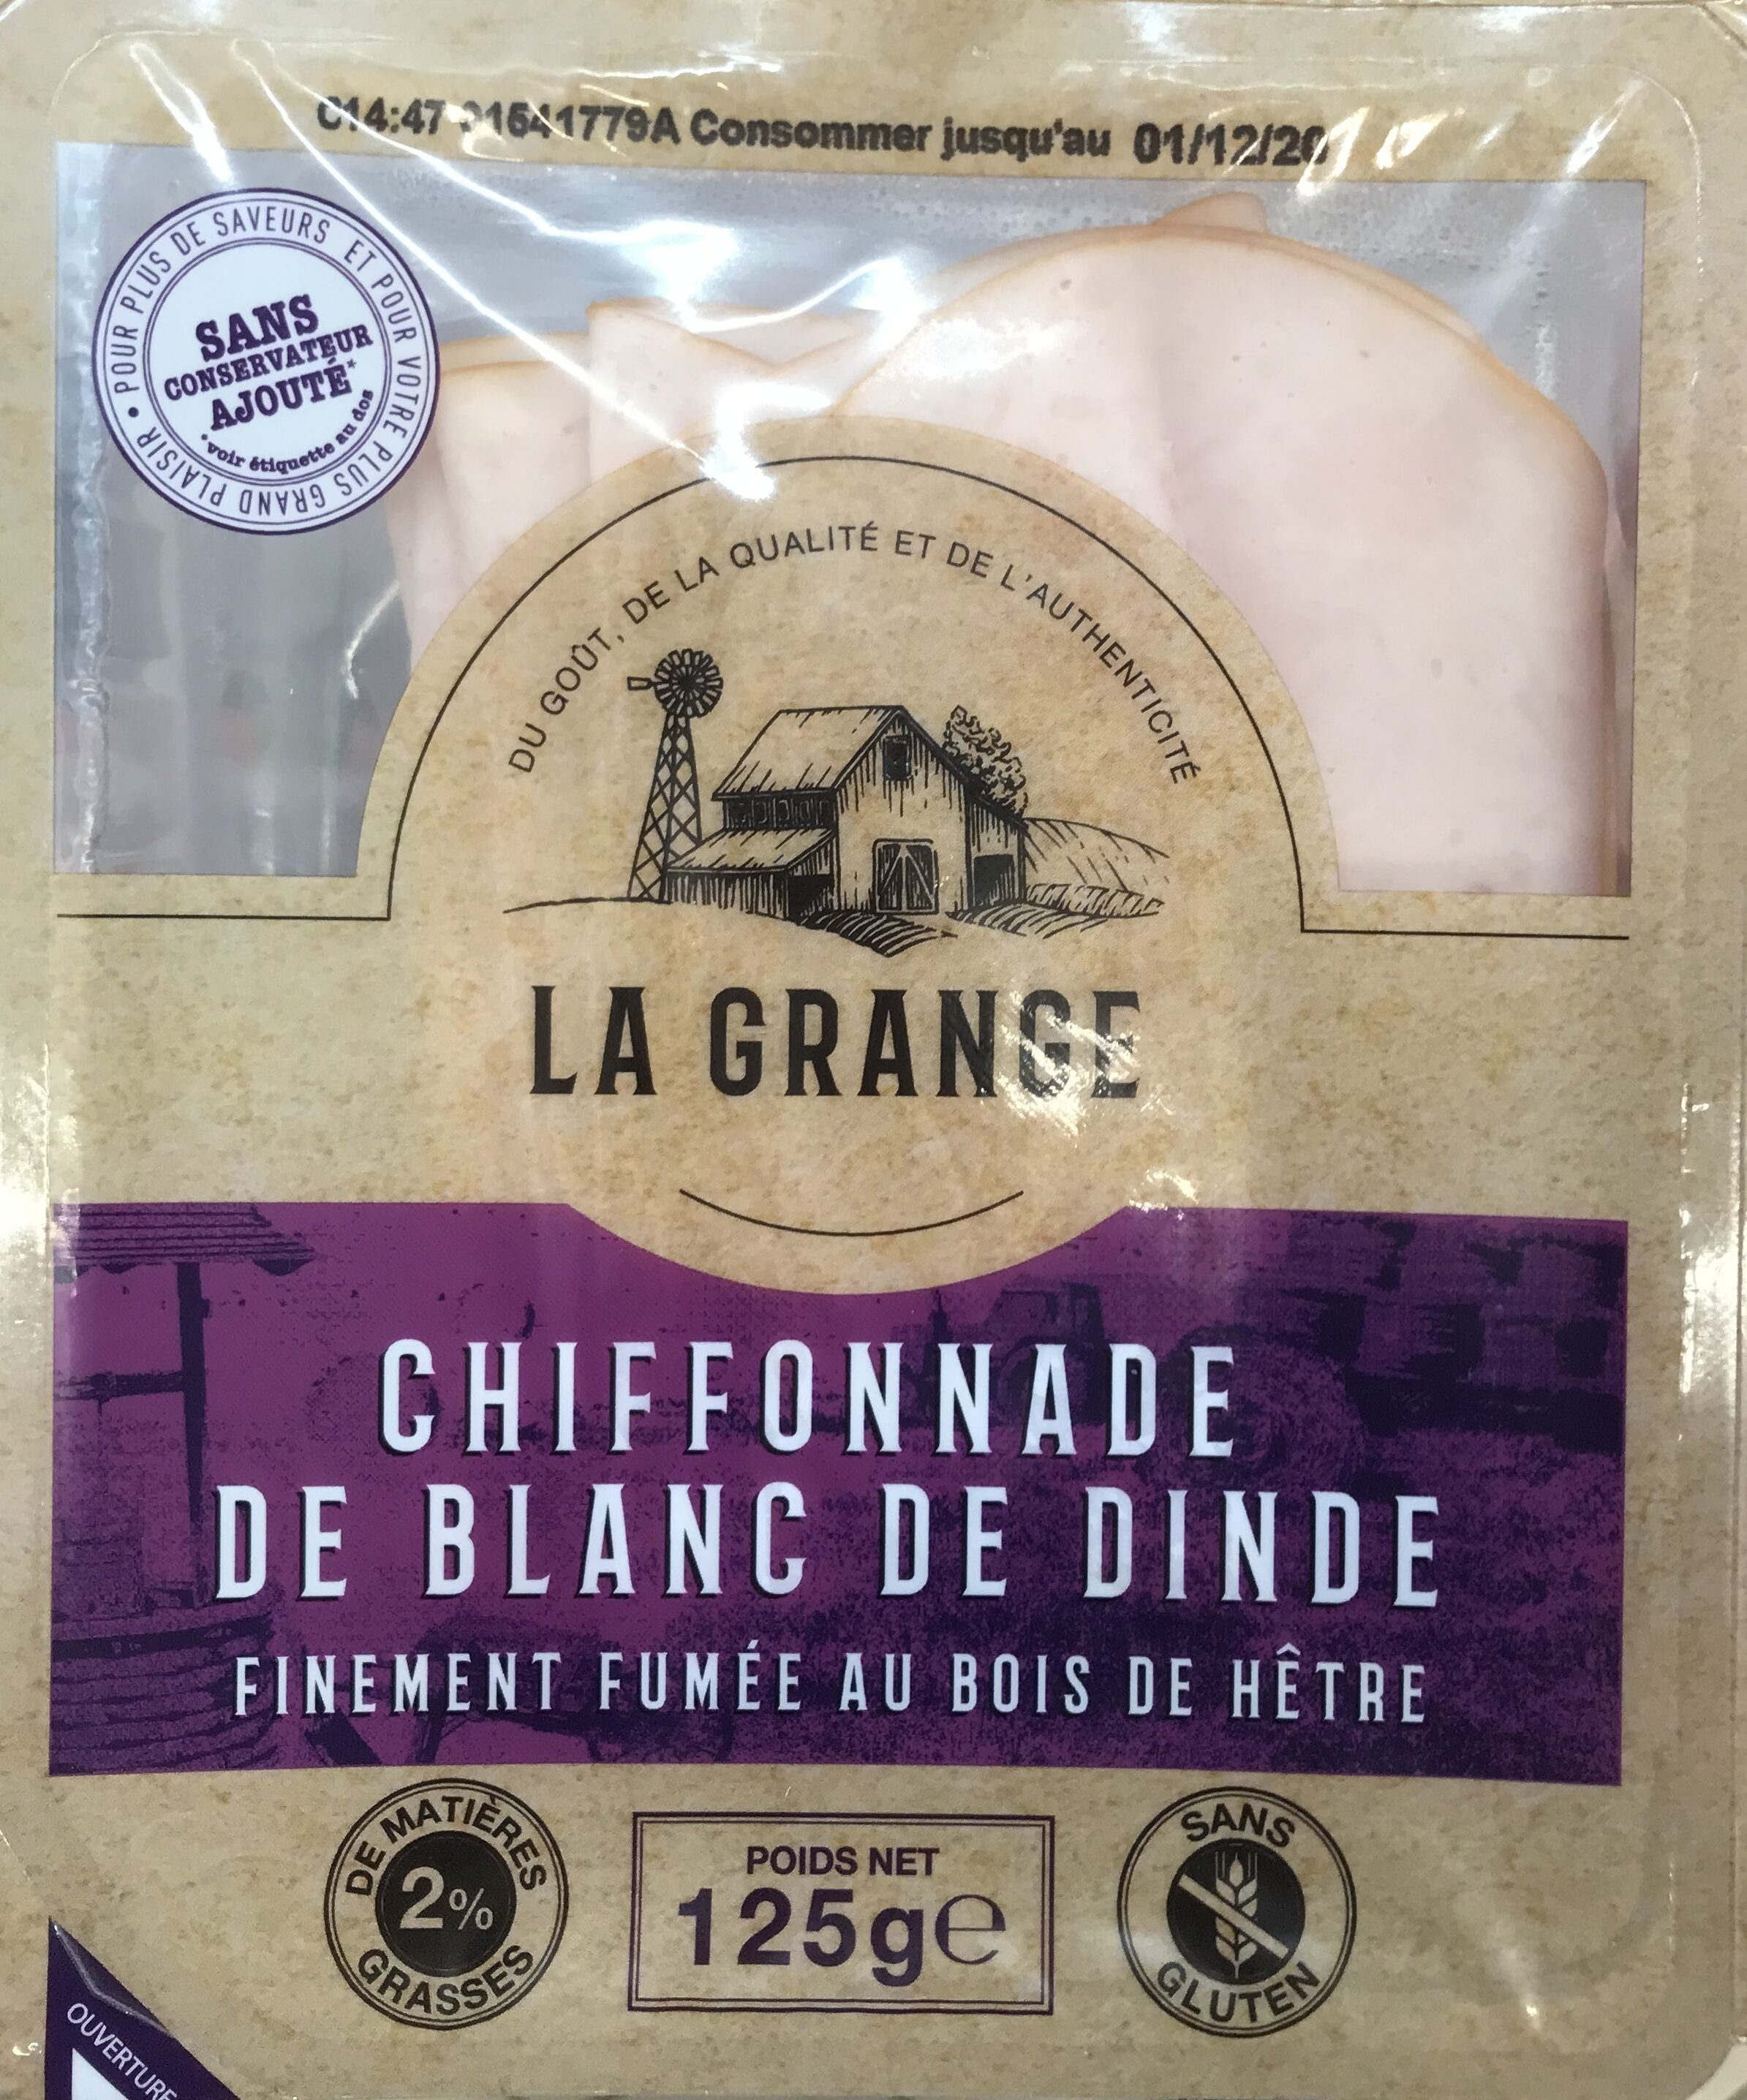 Chiffonade de blanc de dinde - Product - fr